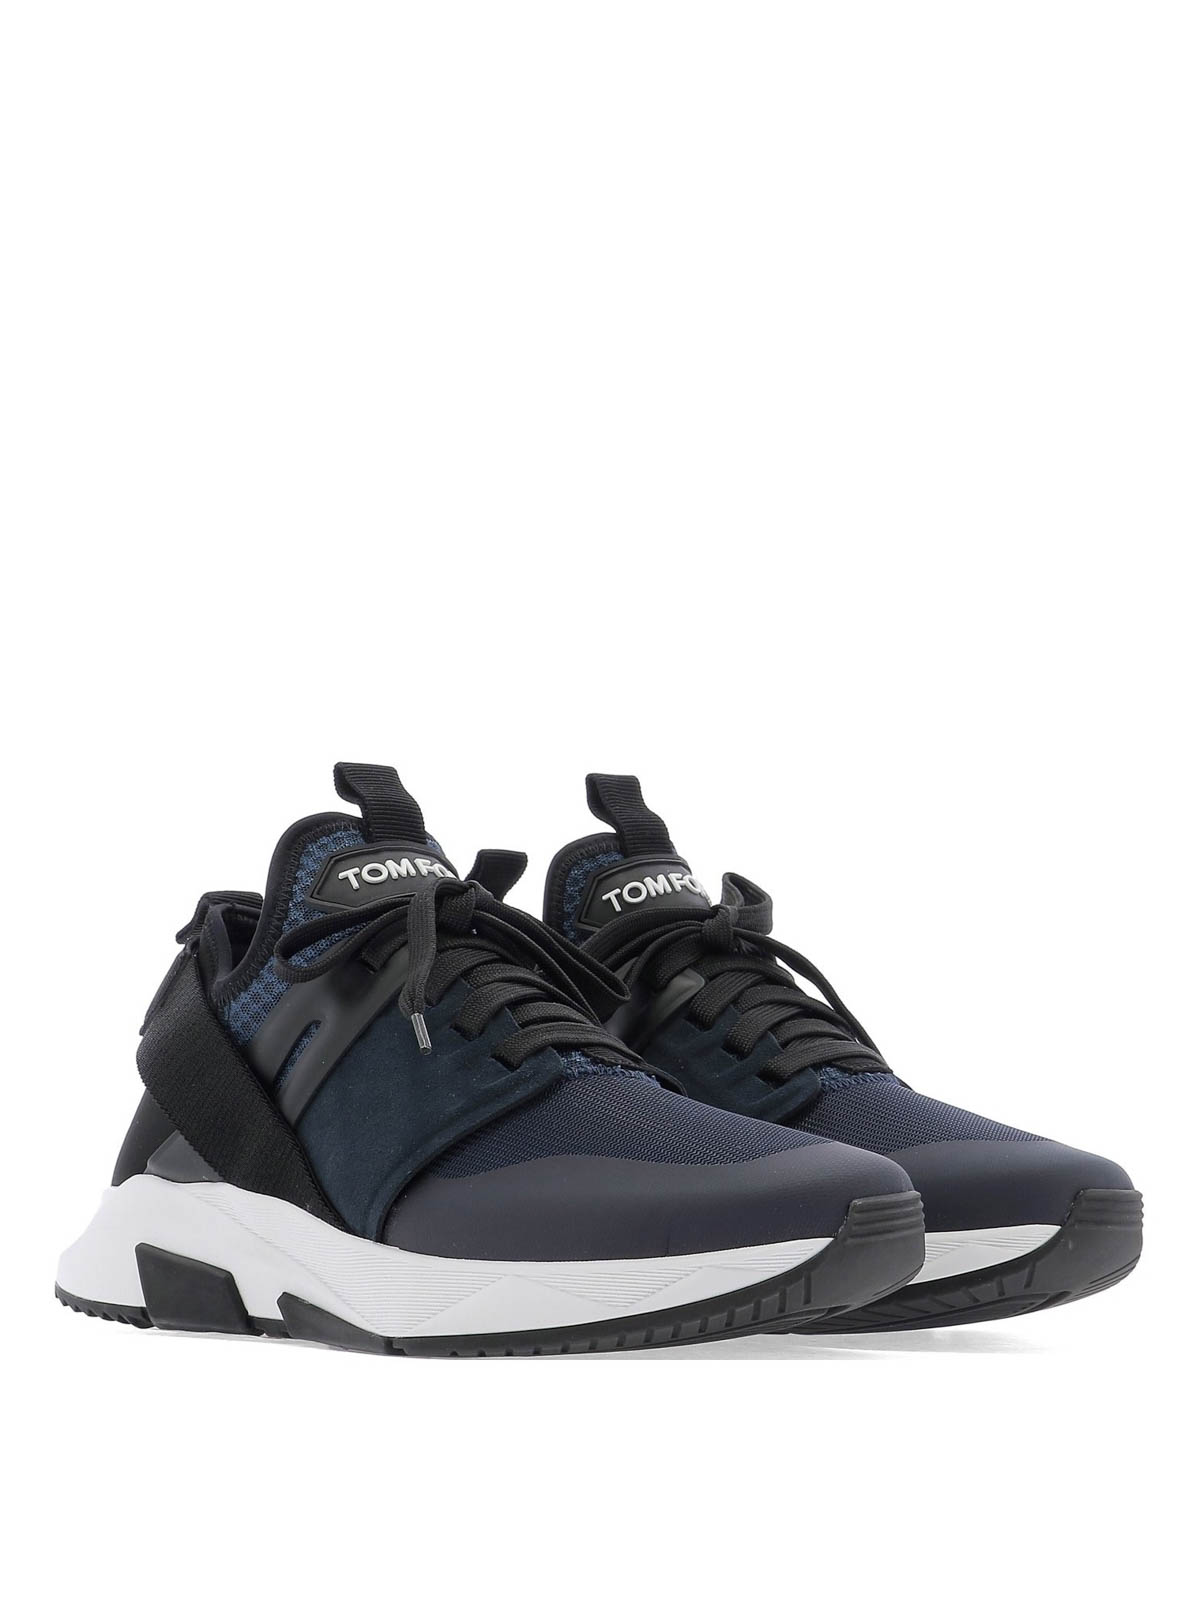 Tom Ford - Jago nylon sneakers